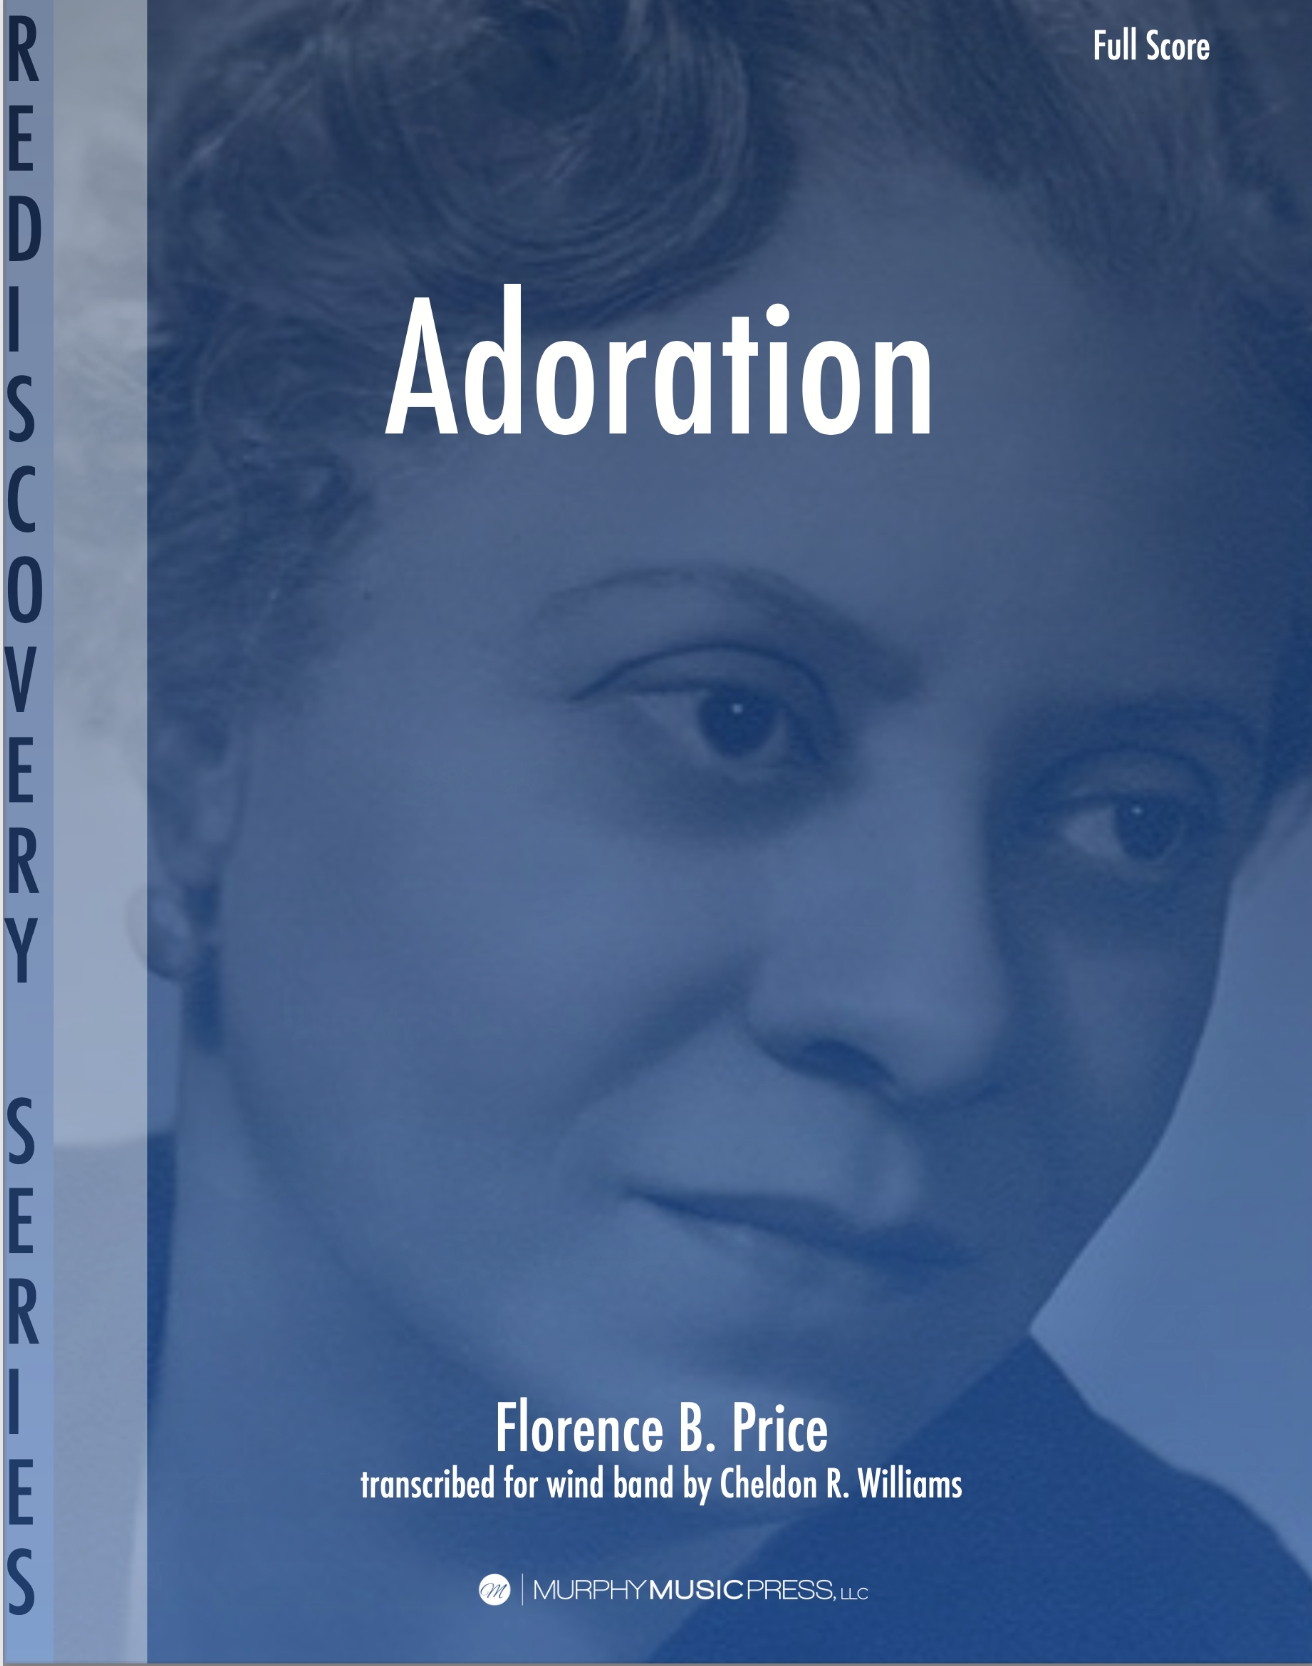 Adoration by Price, arr. Alexandra Dee